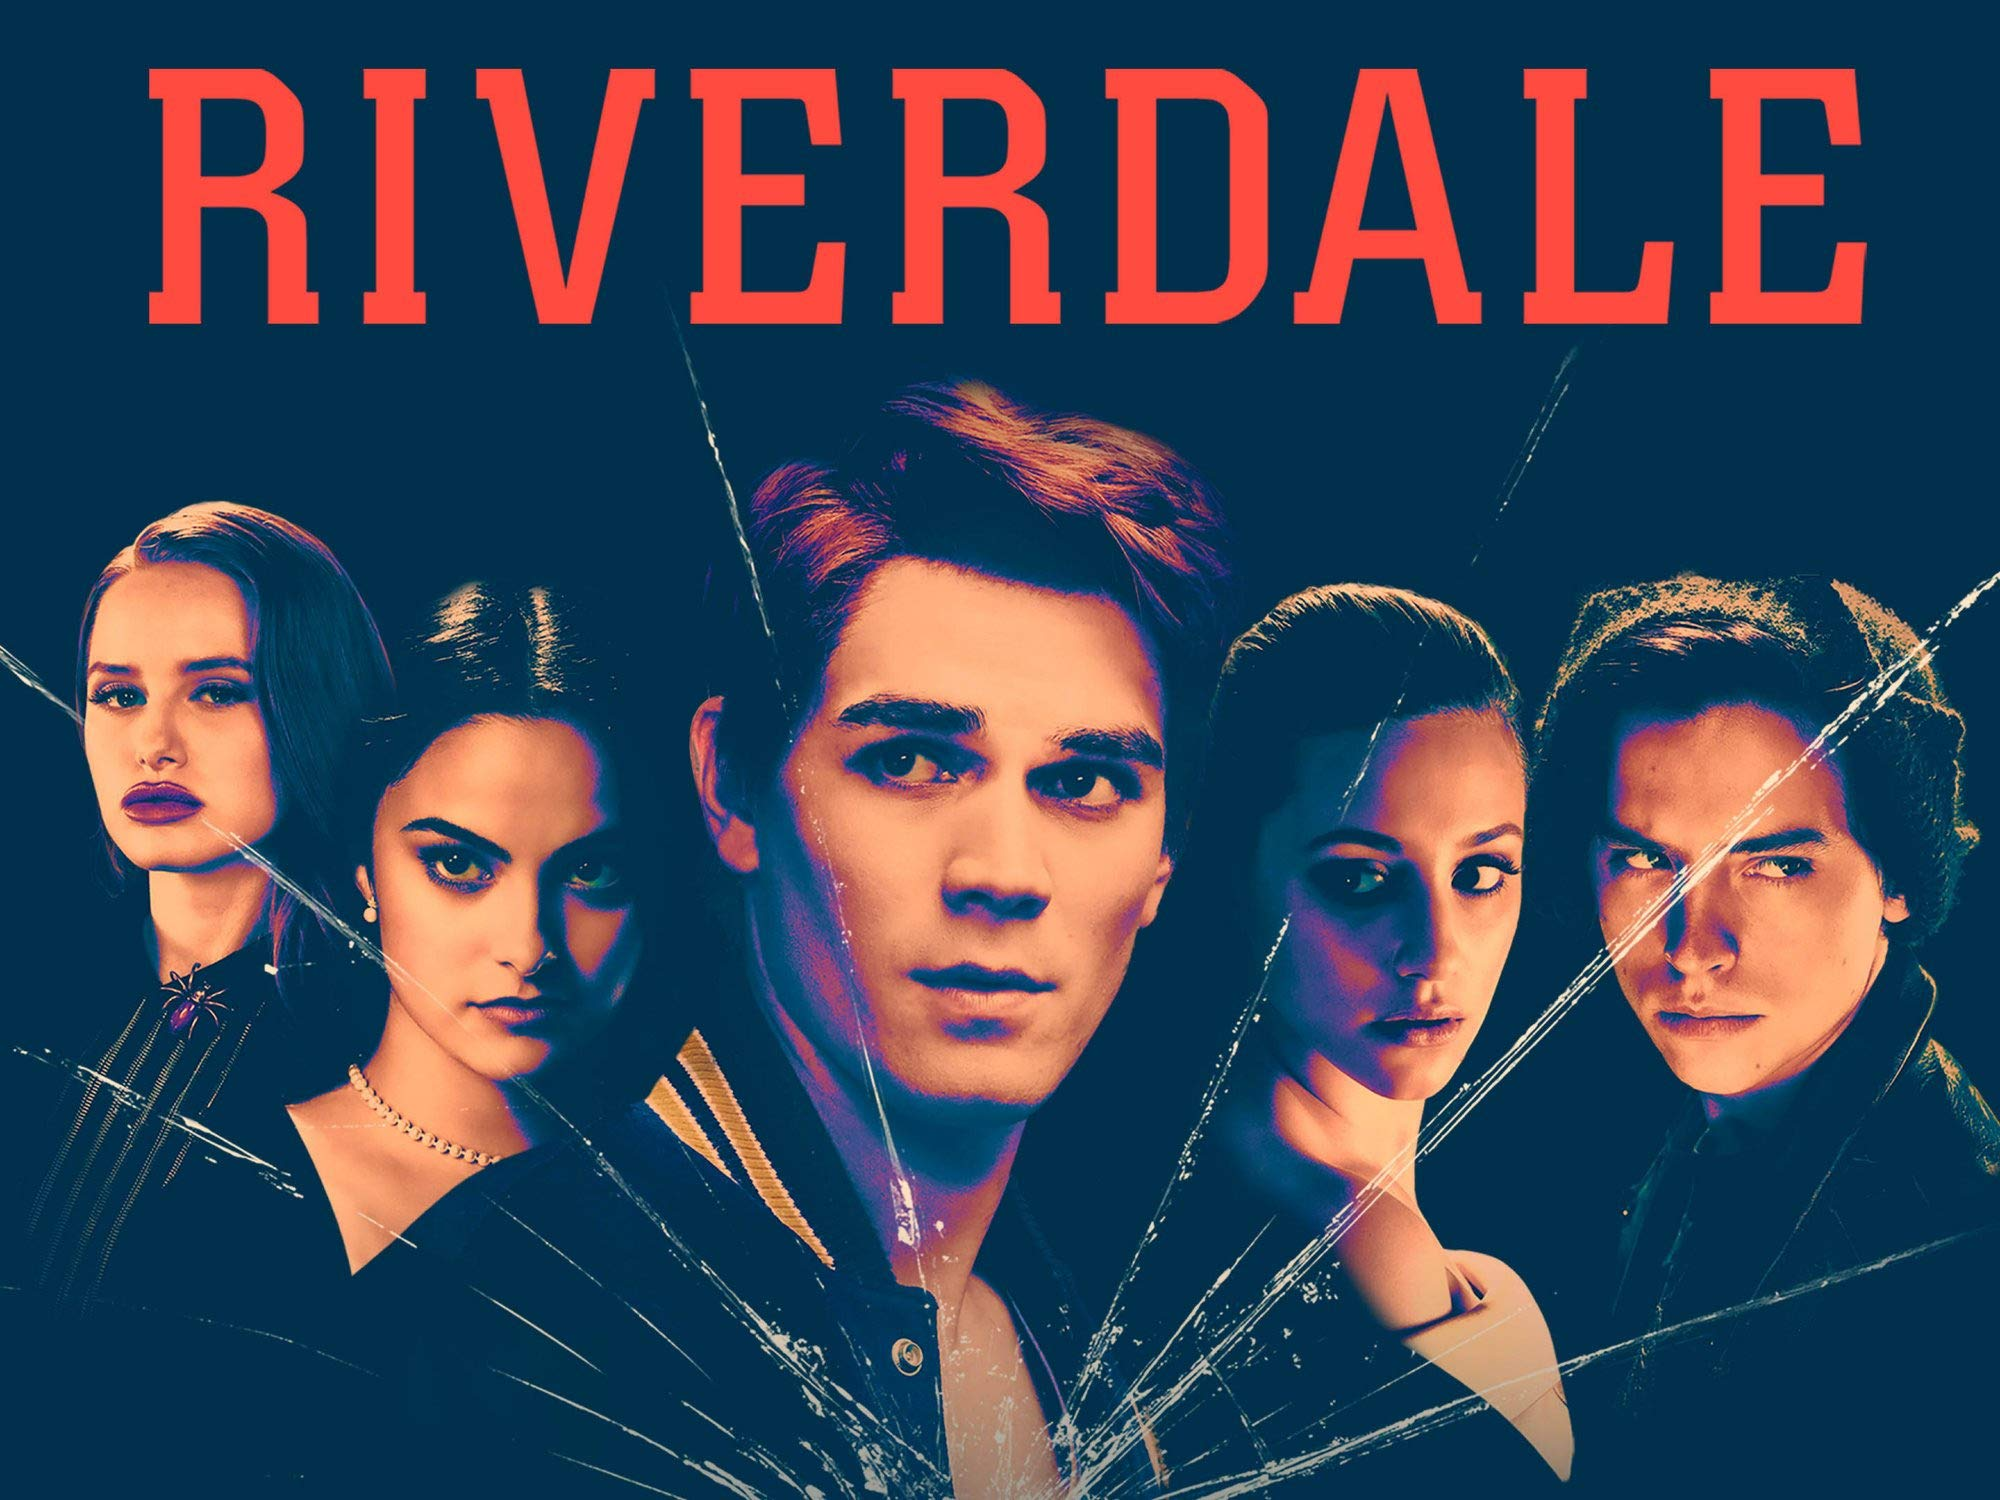 Riverdale Season 4 Episode 18 update